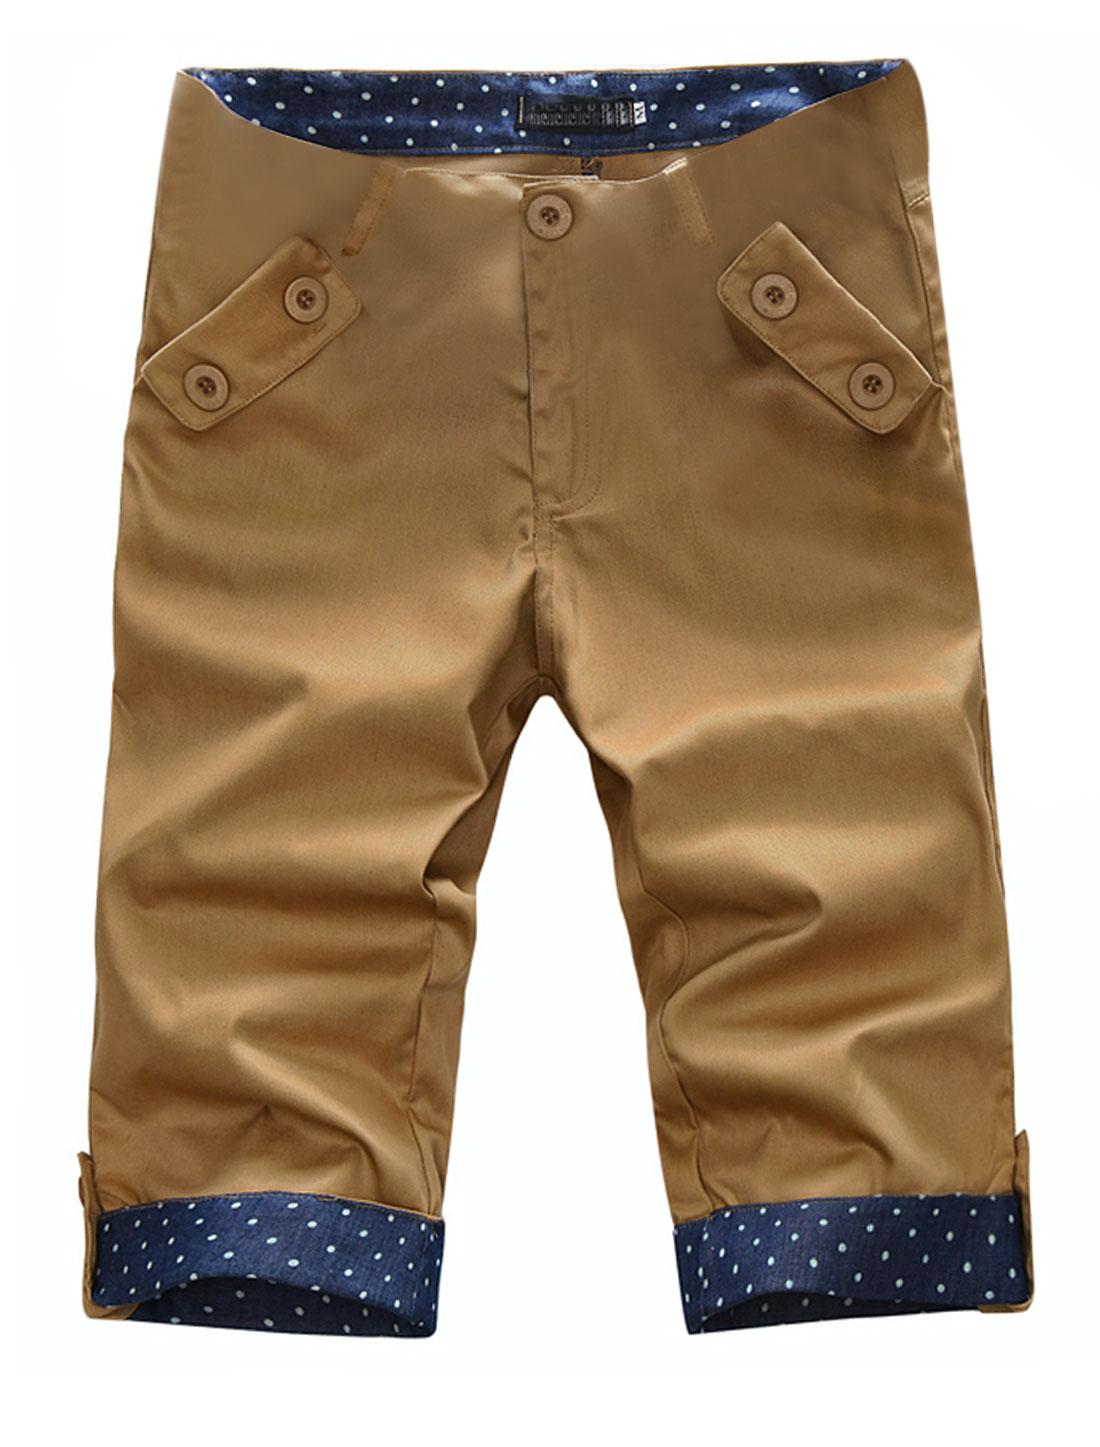 Men Waistband Loop Zip Closure Zip Up Hip Pocket Shorts Khaki W32